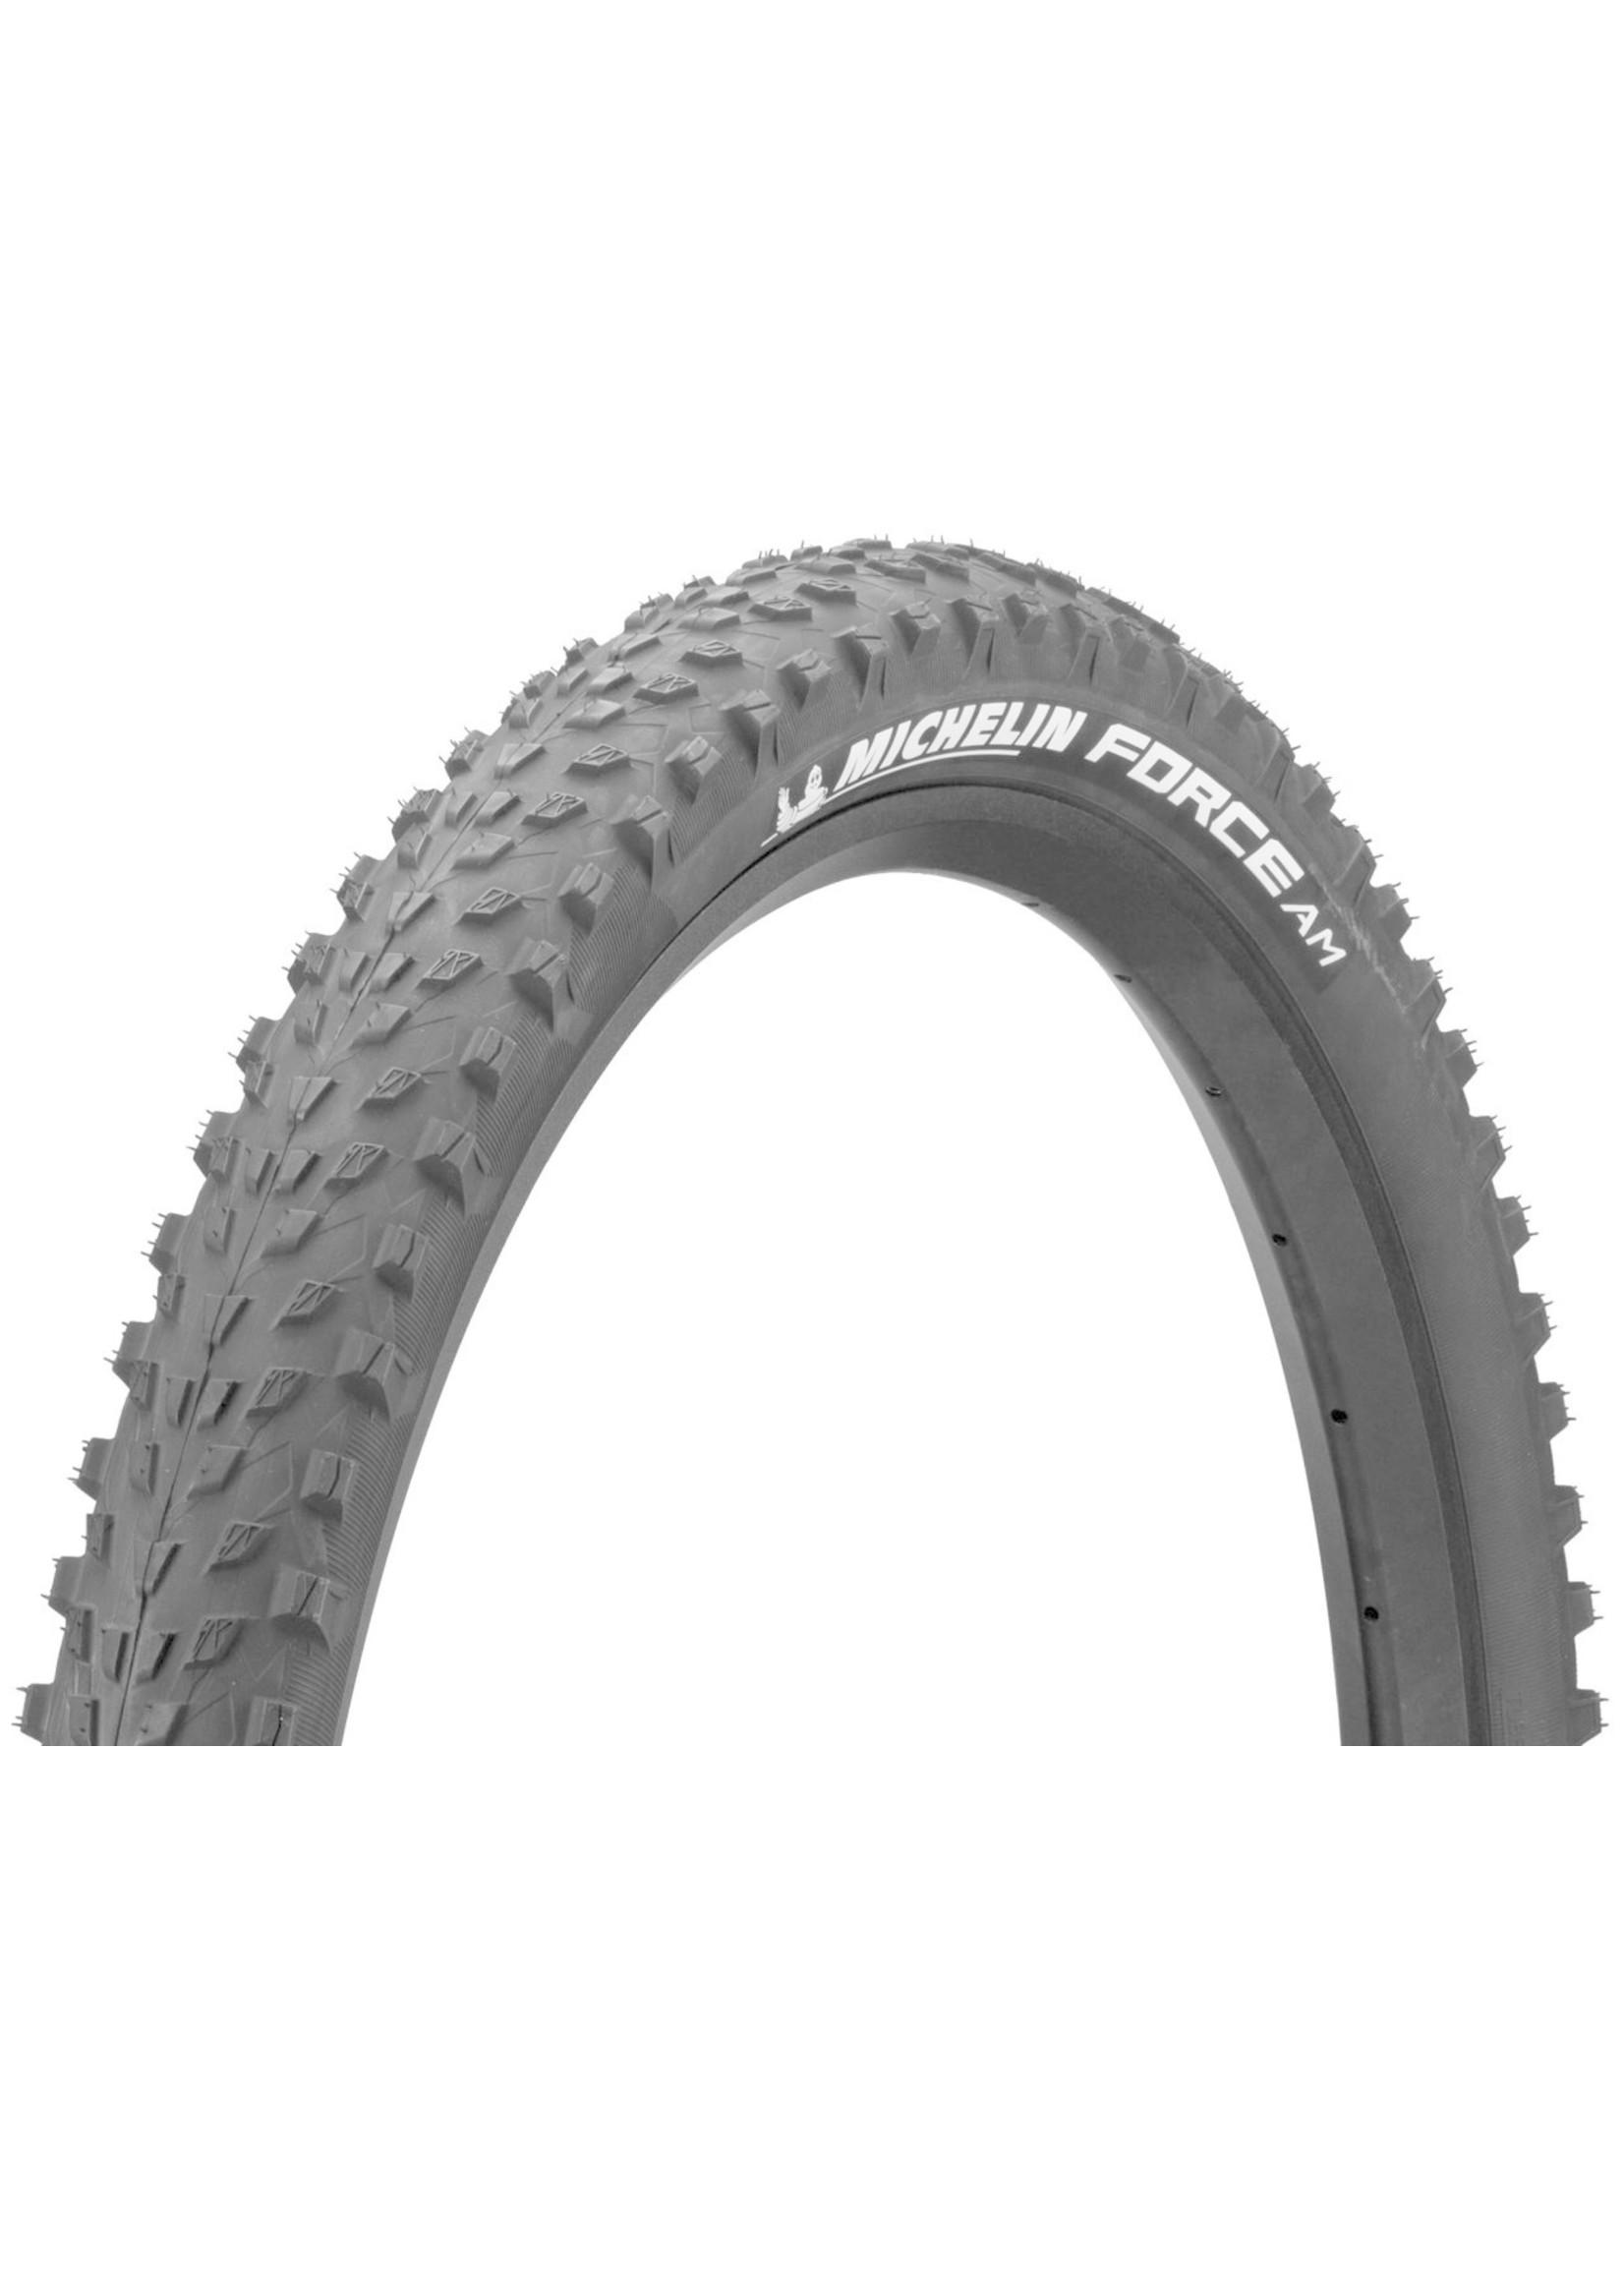 Michelin Michelin, Force AM, 29x2.35, Folding, GUM-X, Tubeless Ready, Black